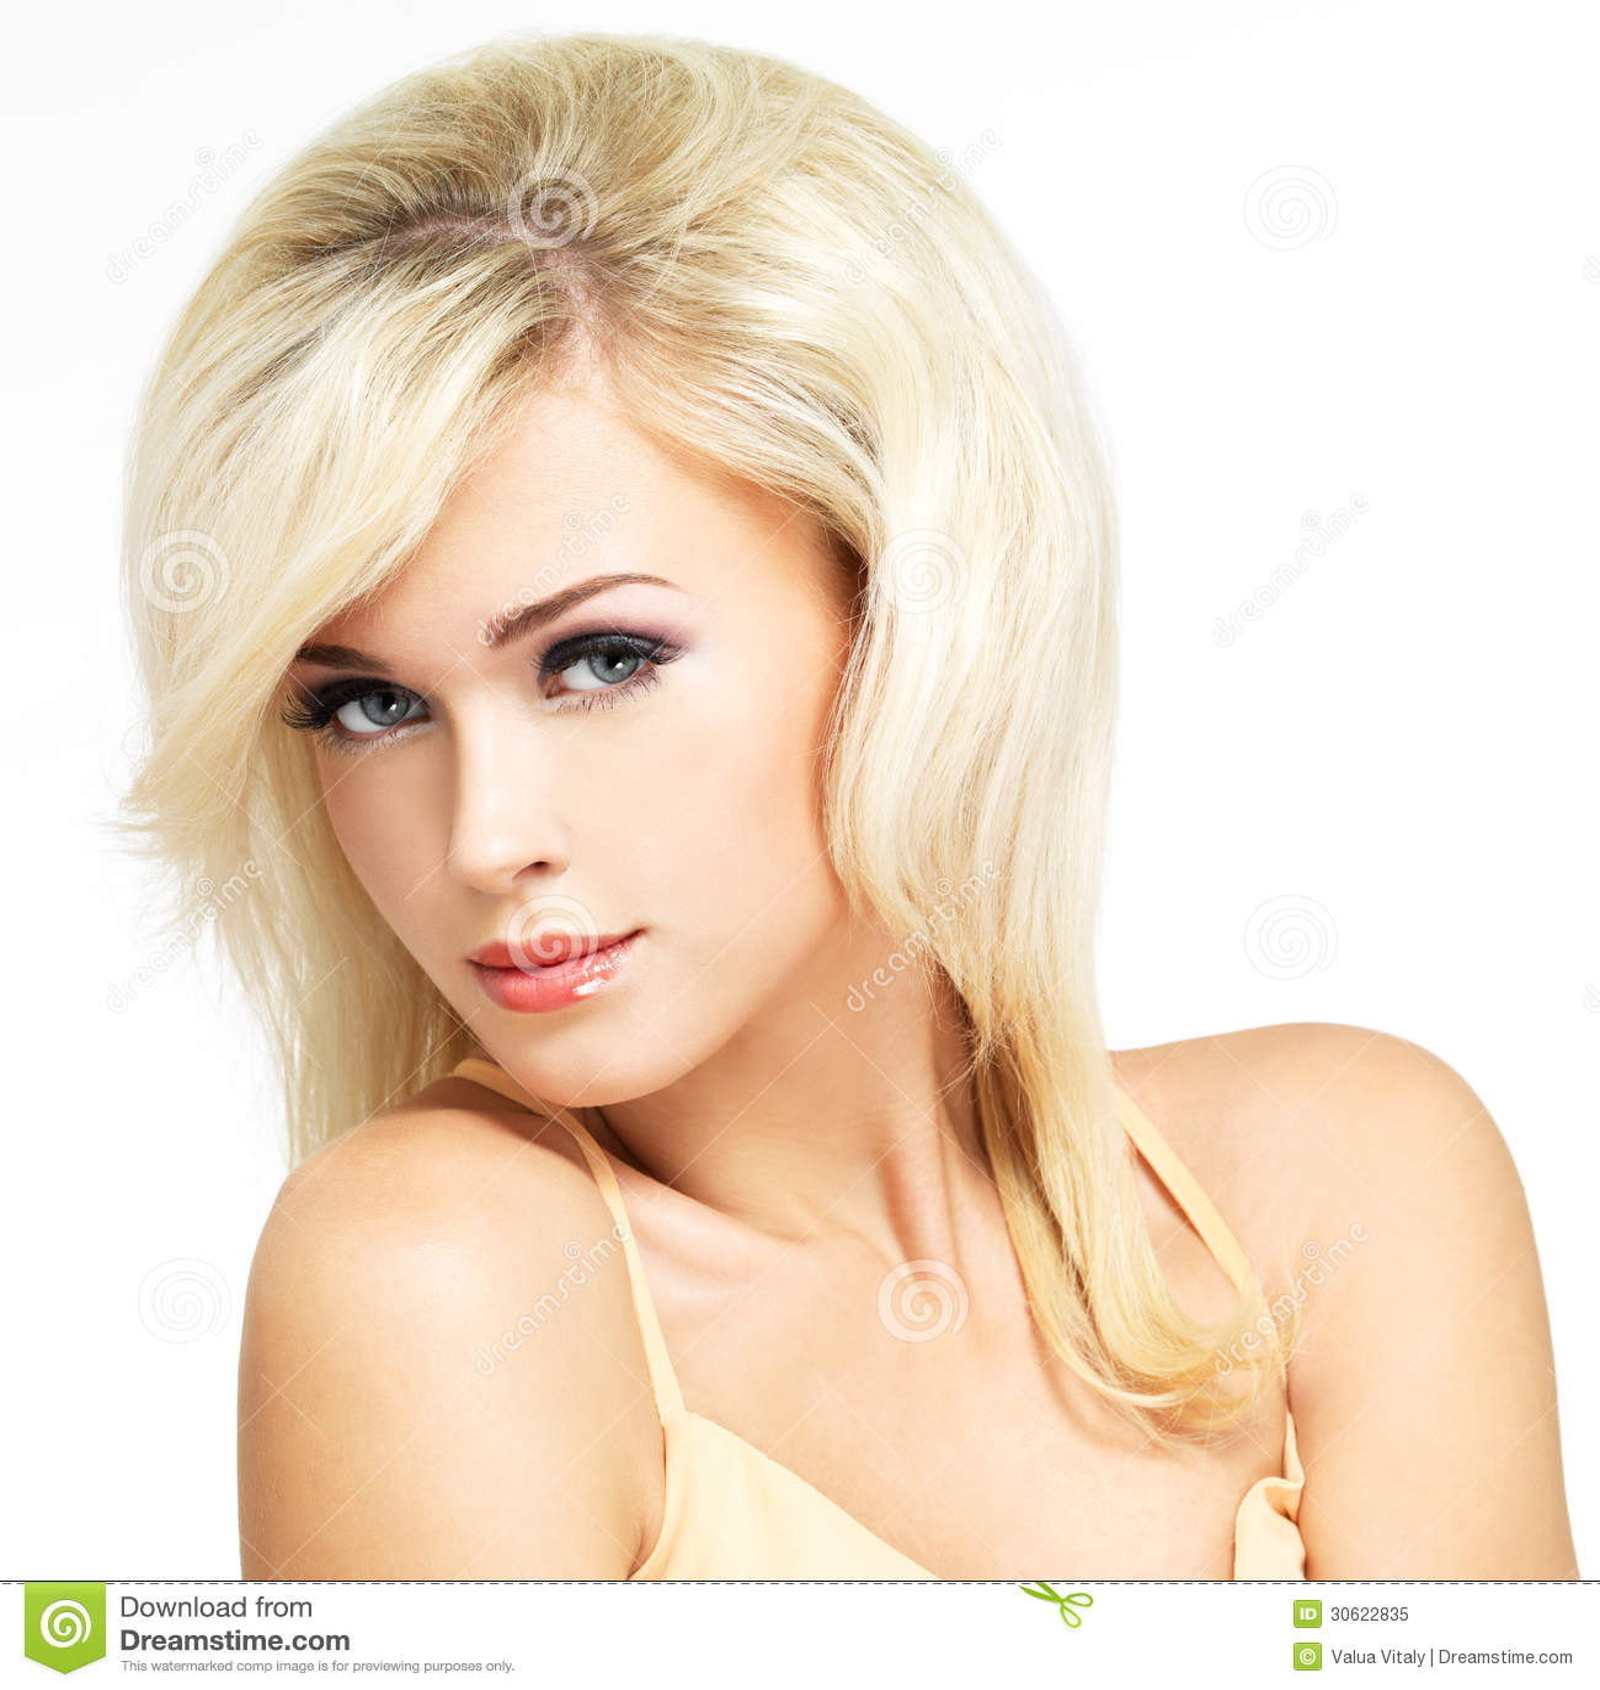 hairstyle background - photo #42